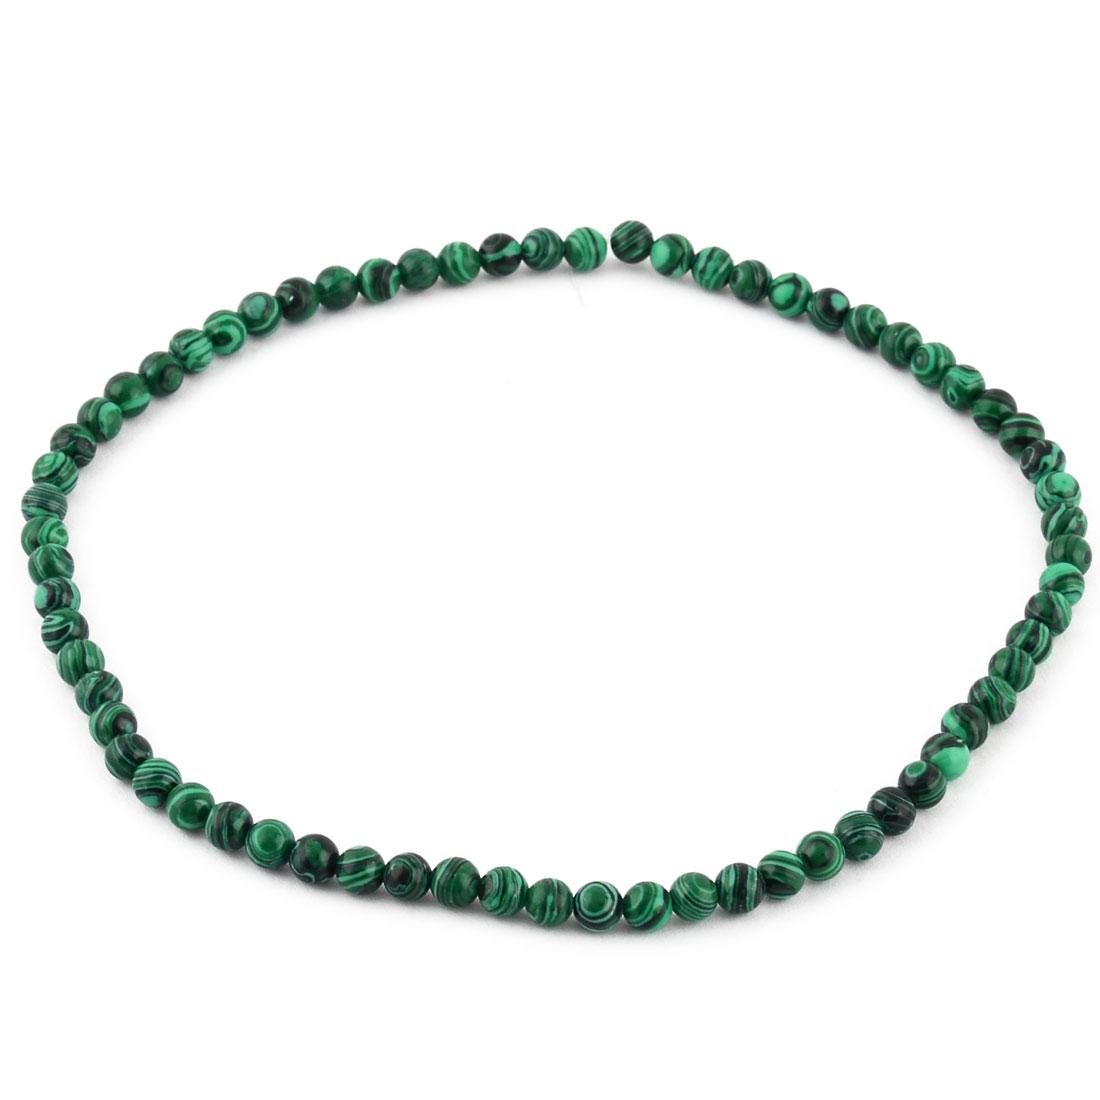 Malachite Pattern Beading Decor Necklace Bracelet Making Beads Strand 0.6cm Dia